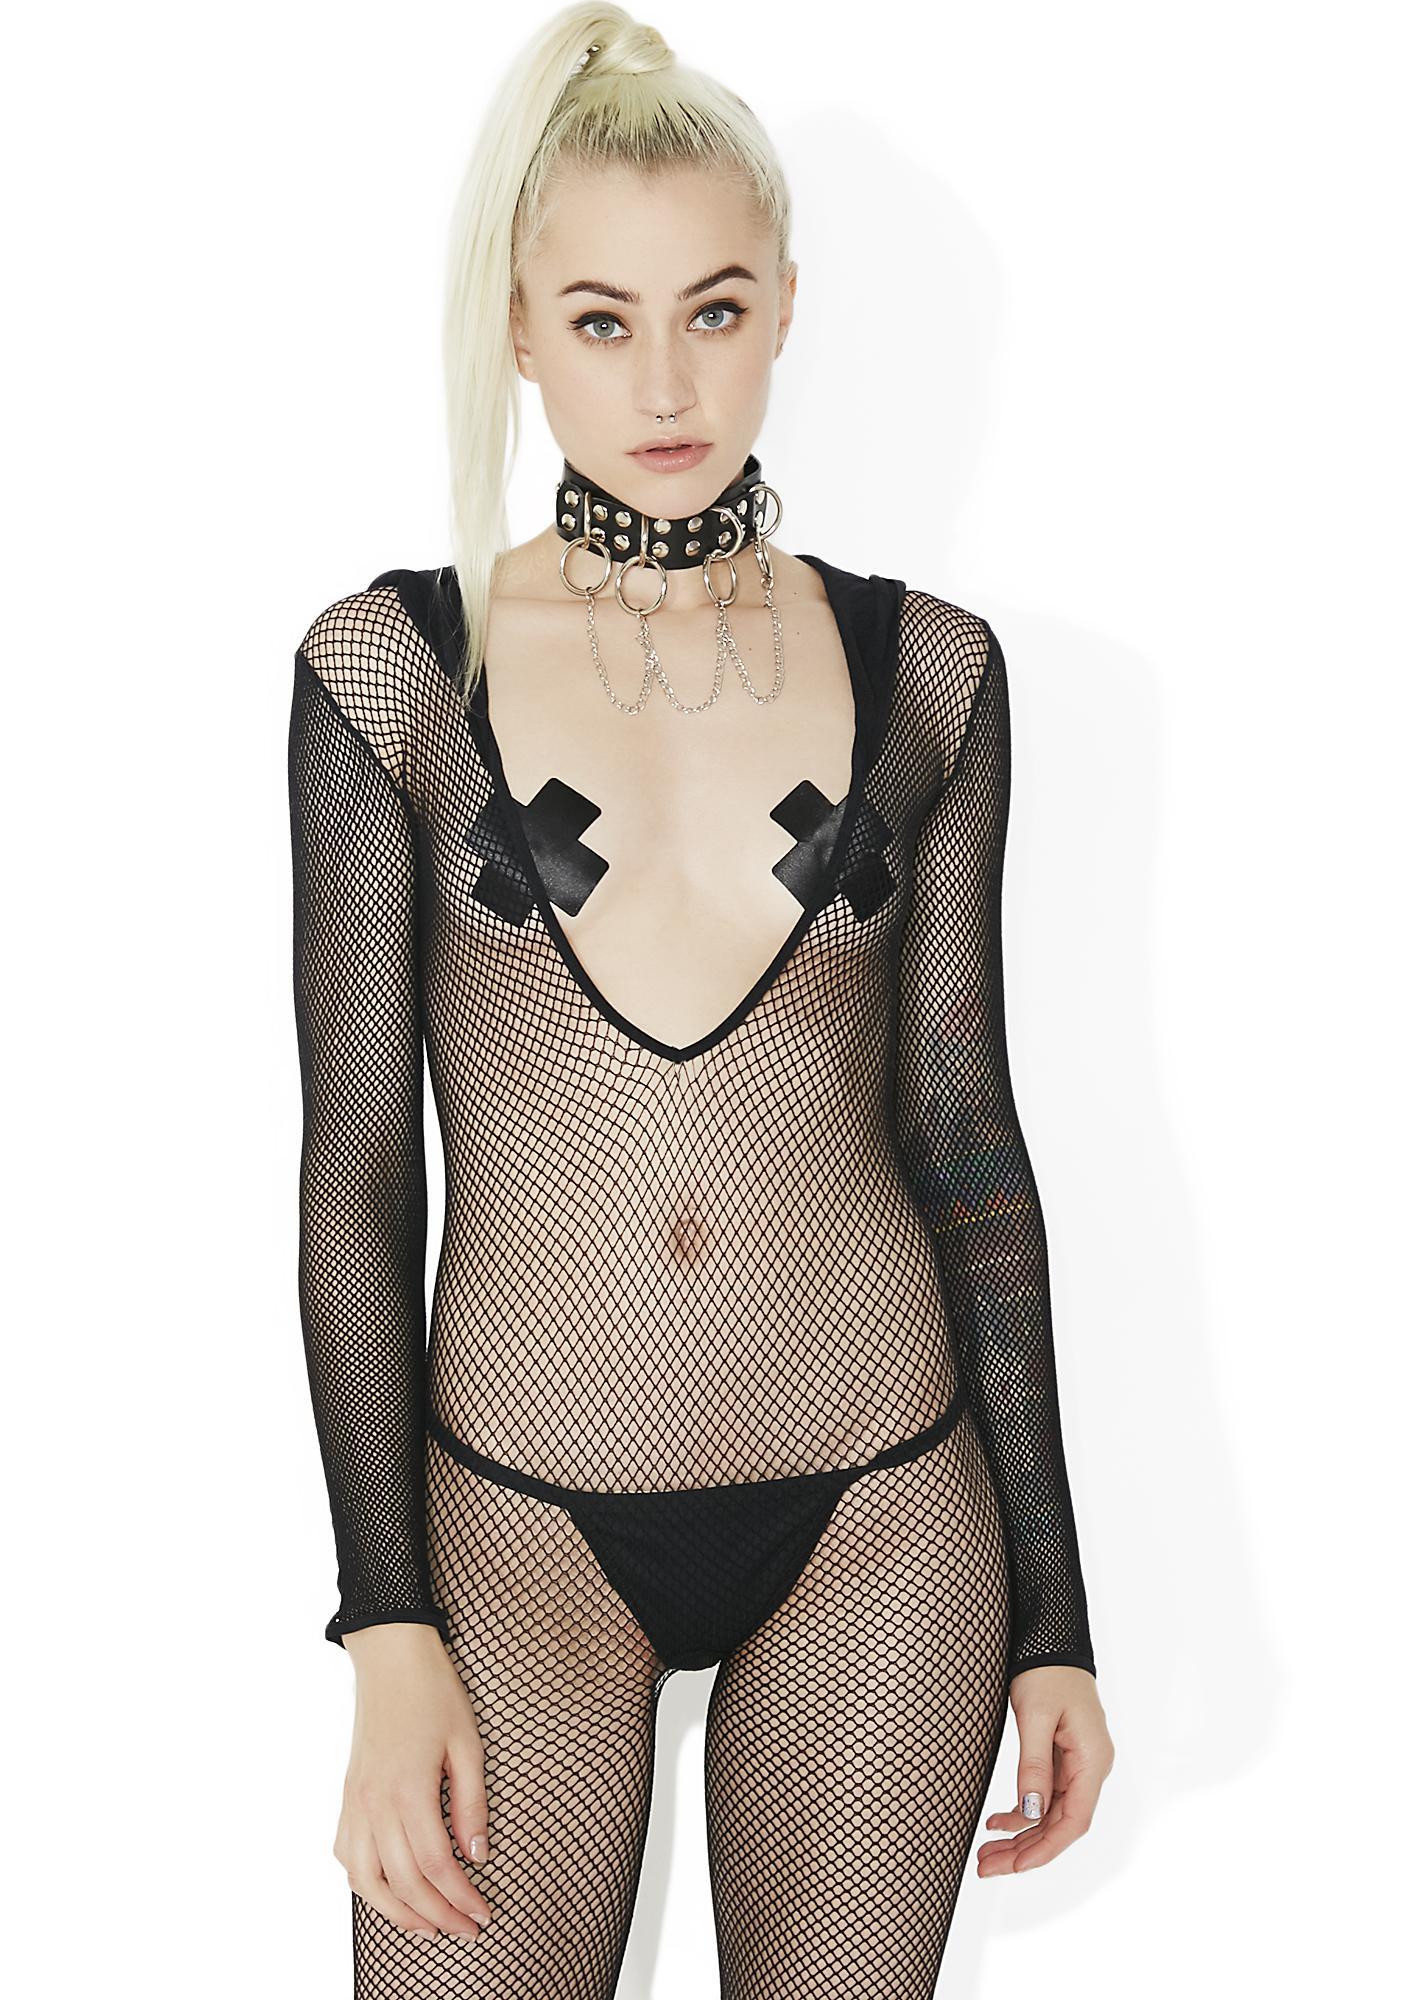 Madame Assassin Hooded Fishnet Bodystocking